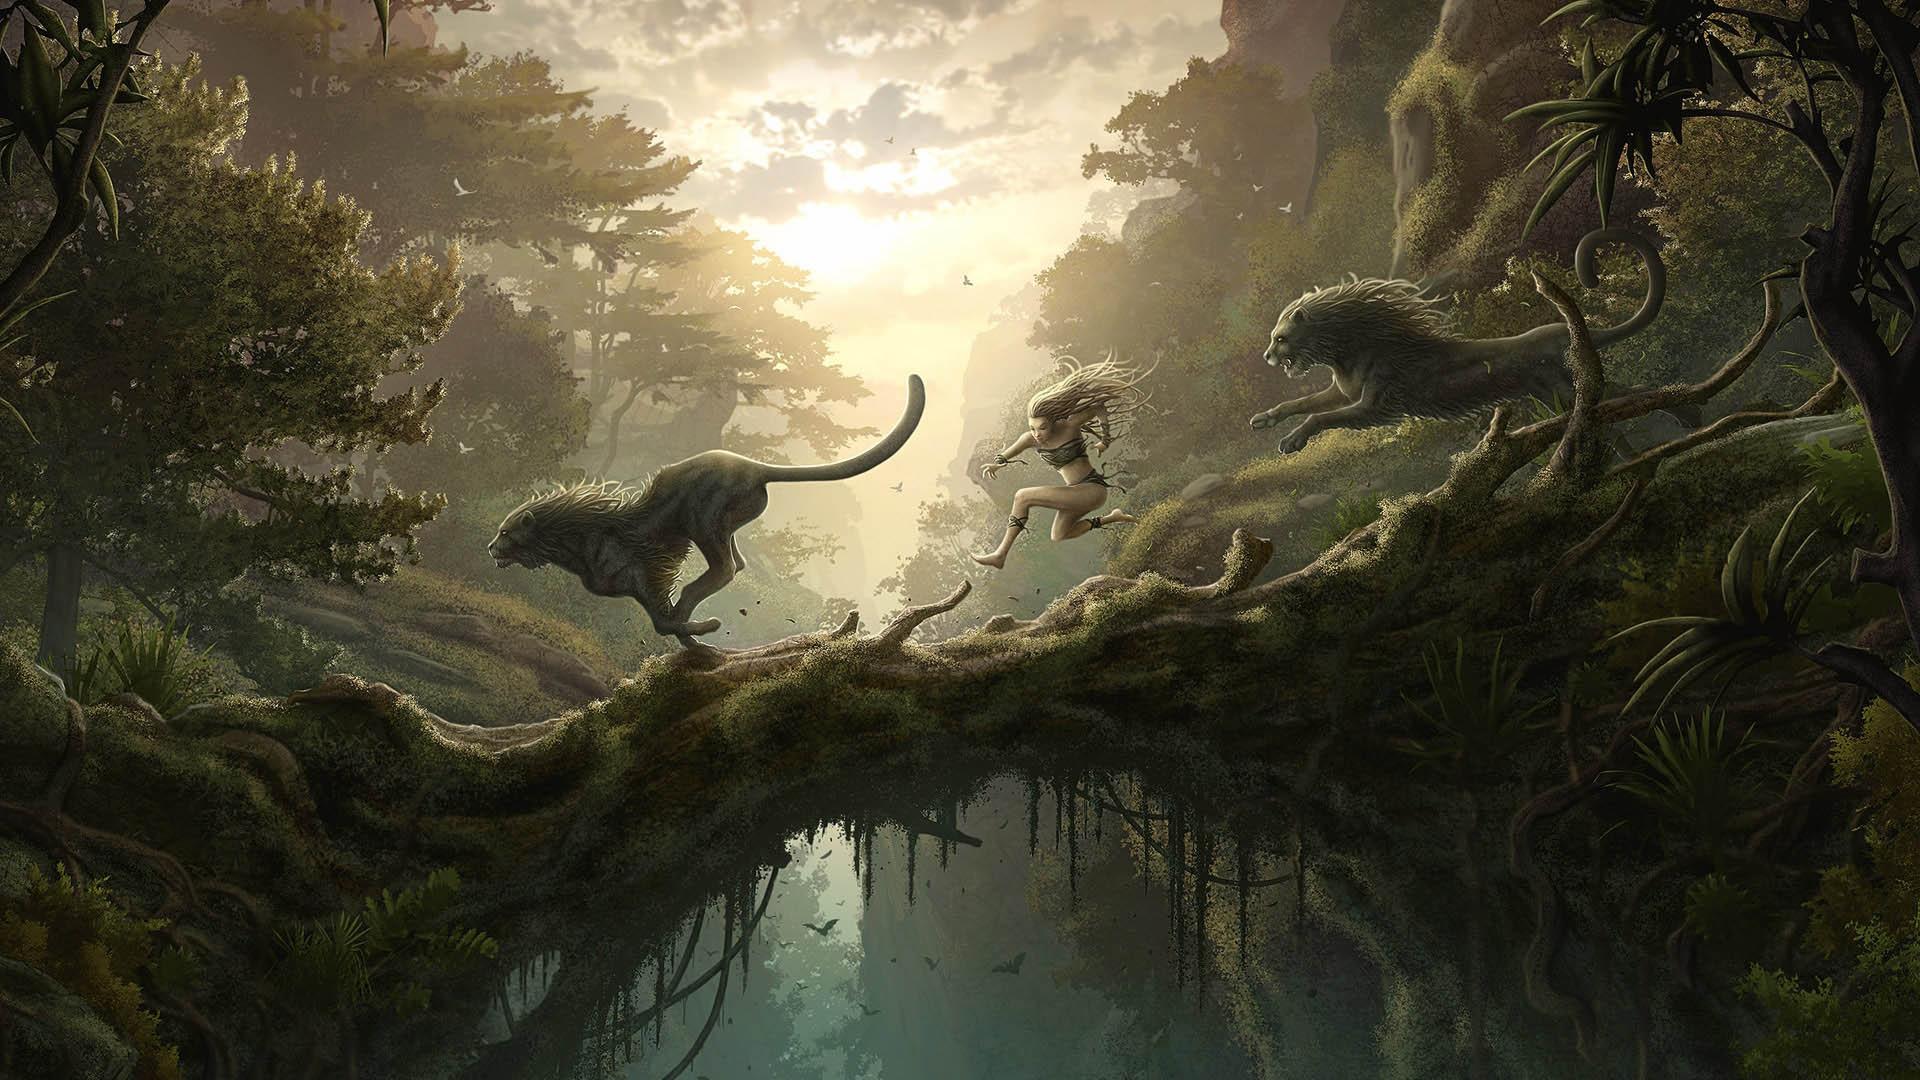 HD Fantasy World 4k Cover